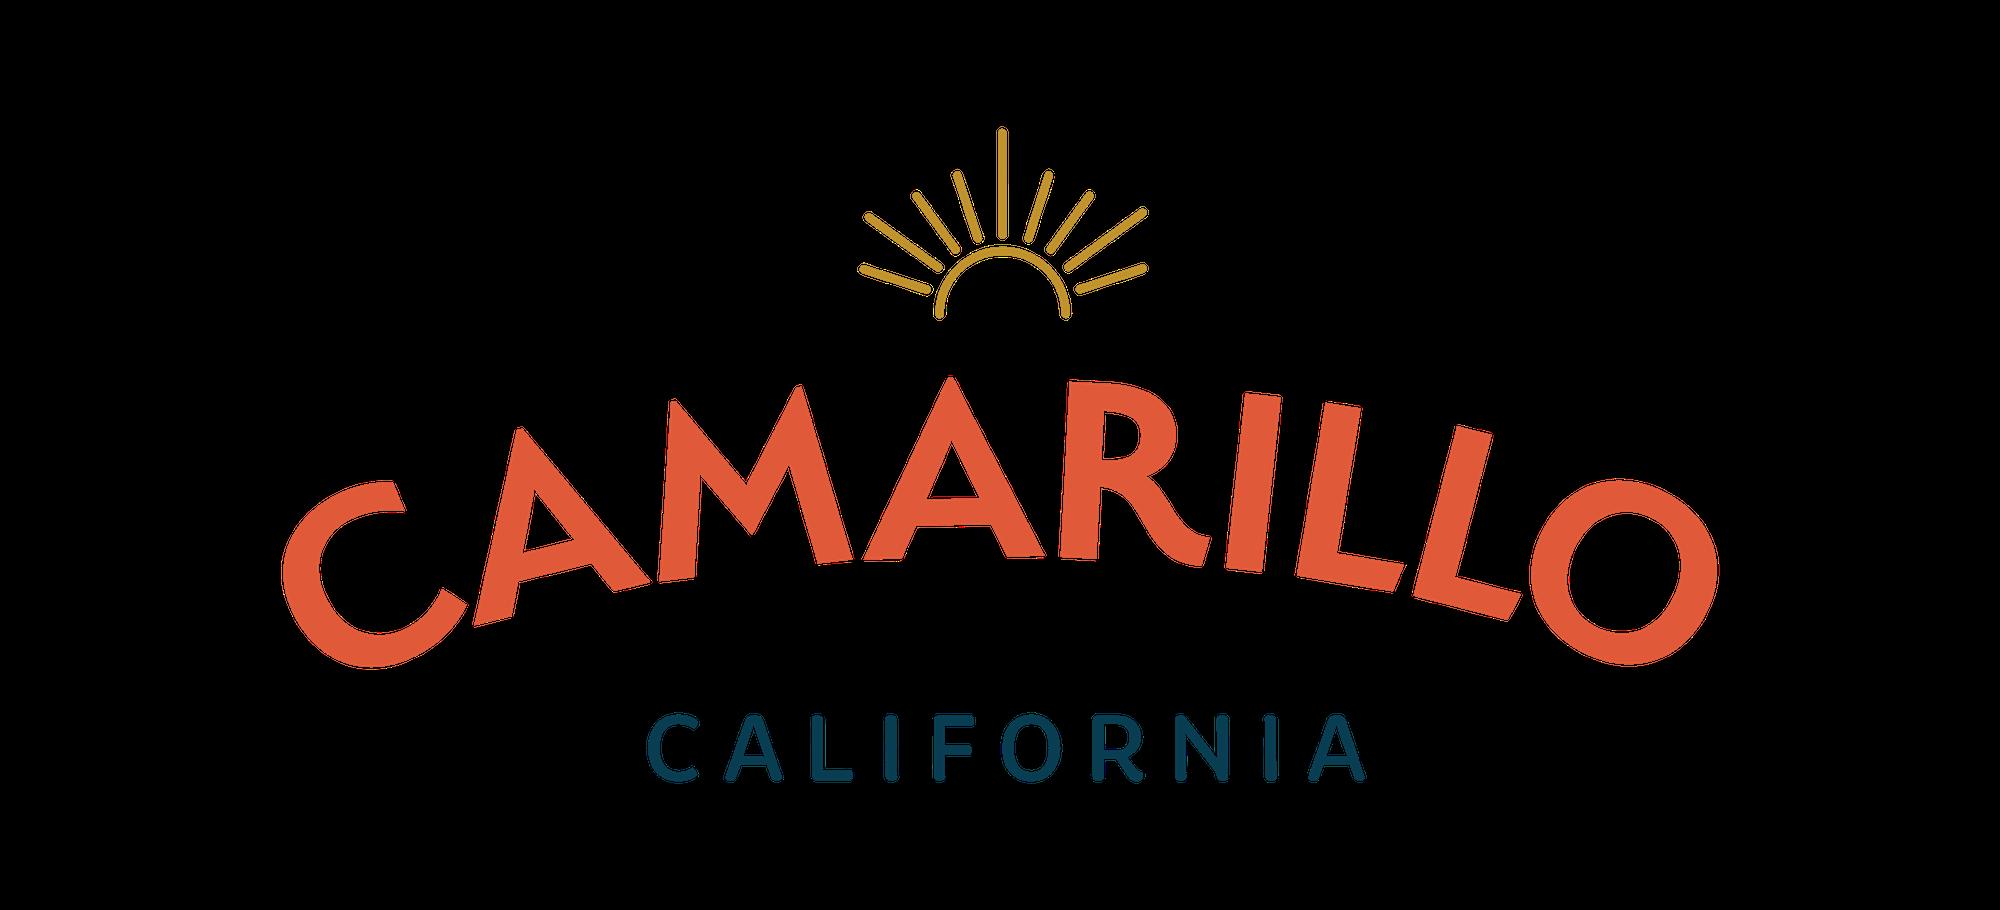 Visit Camarillo logo